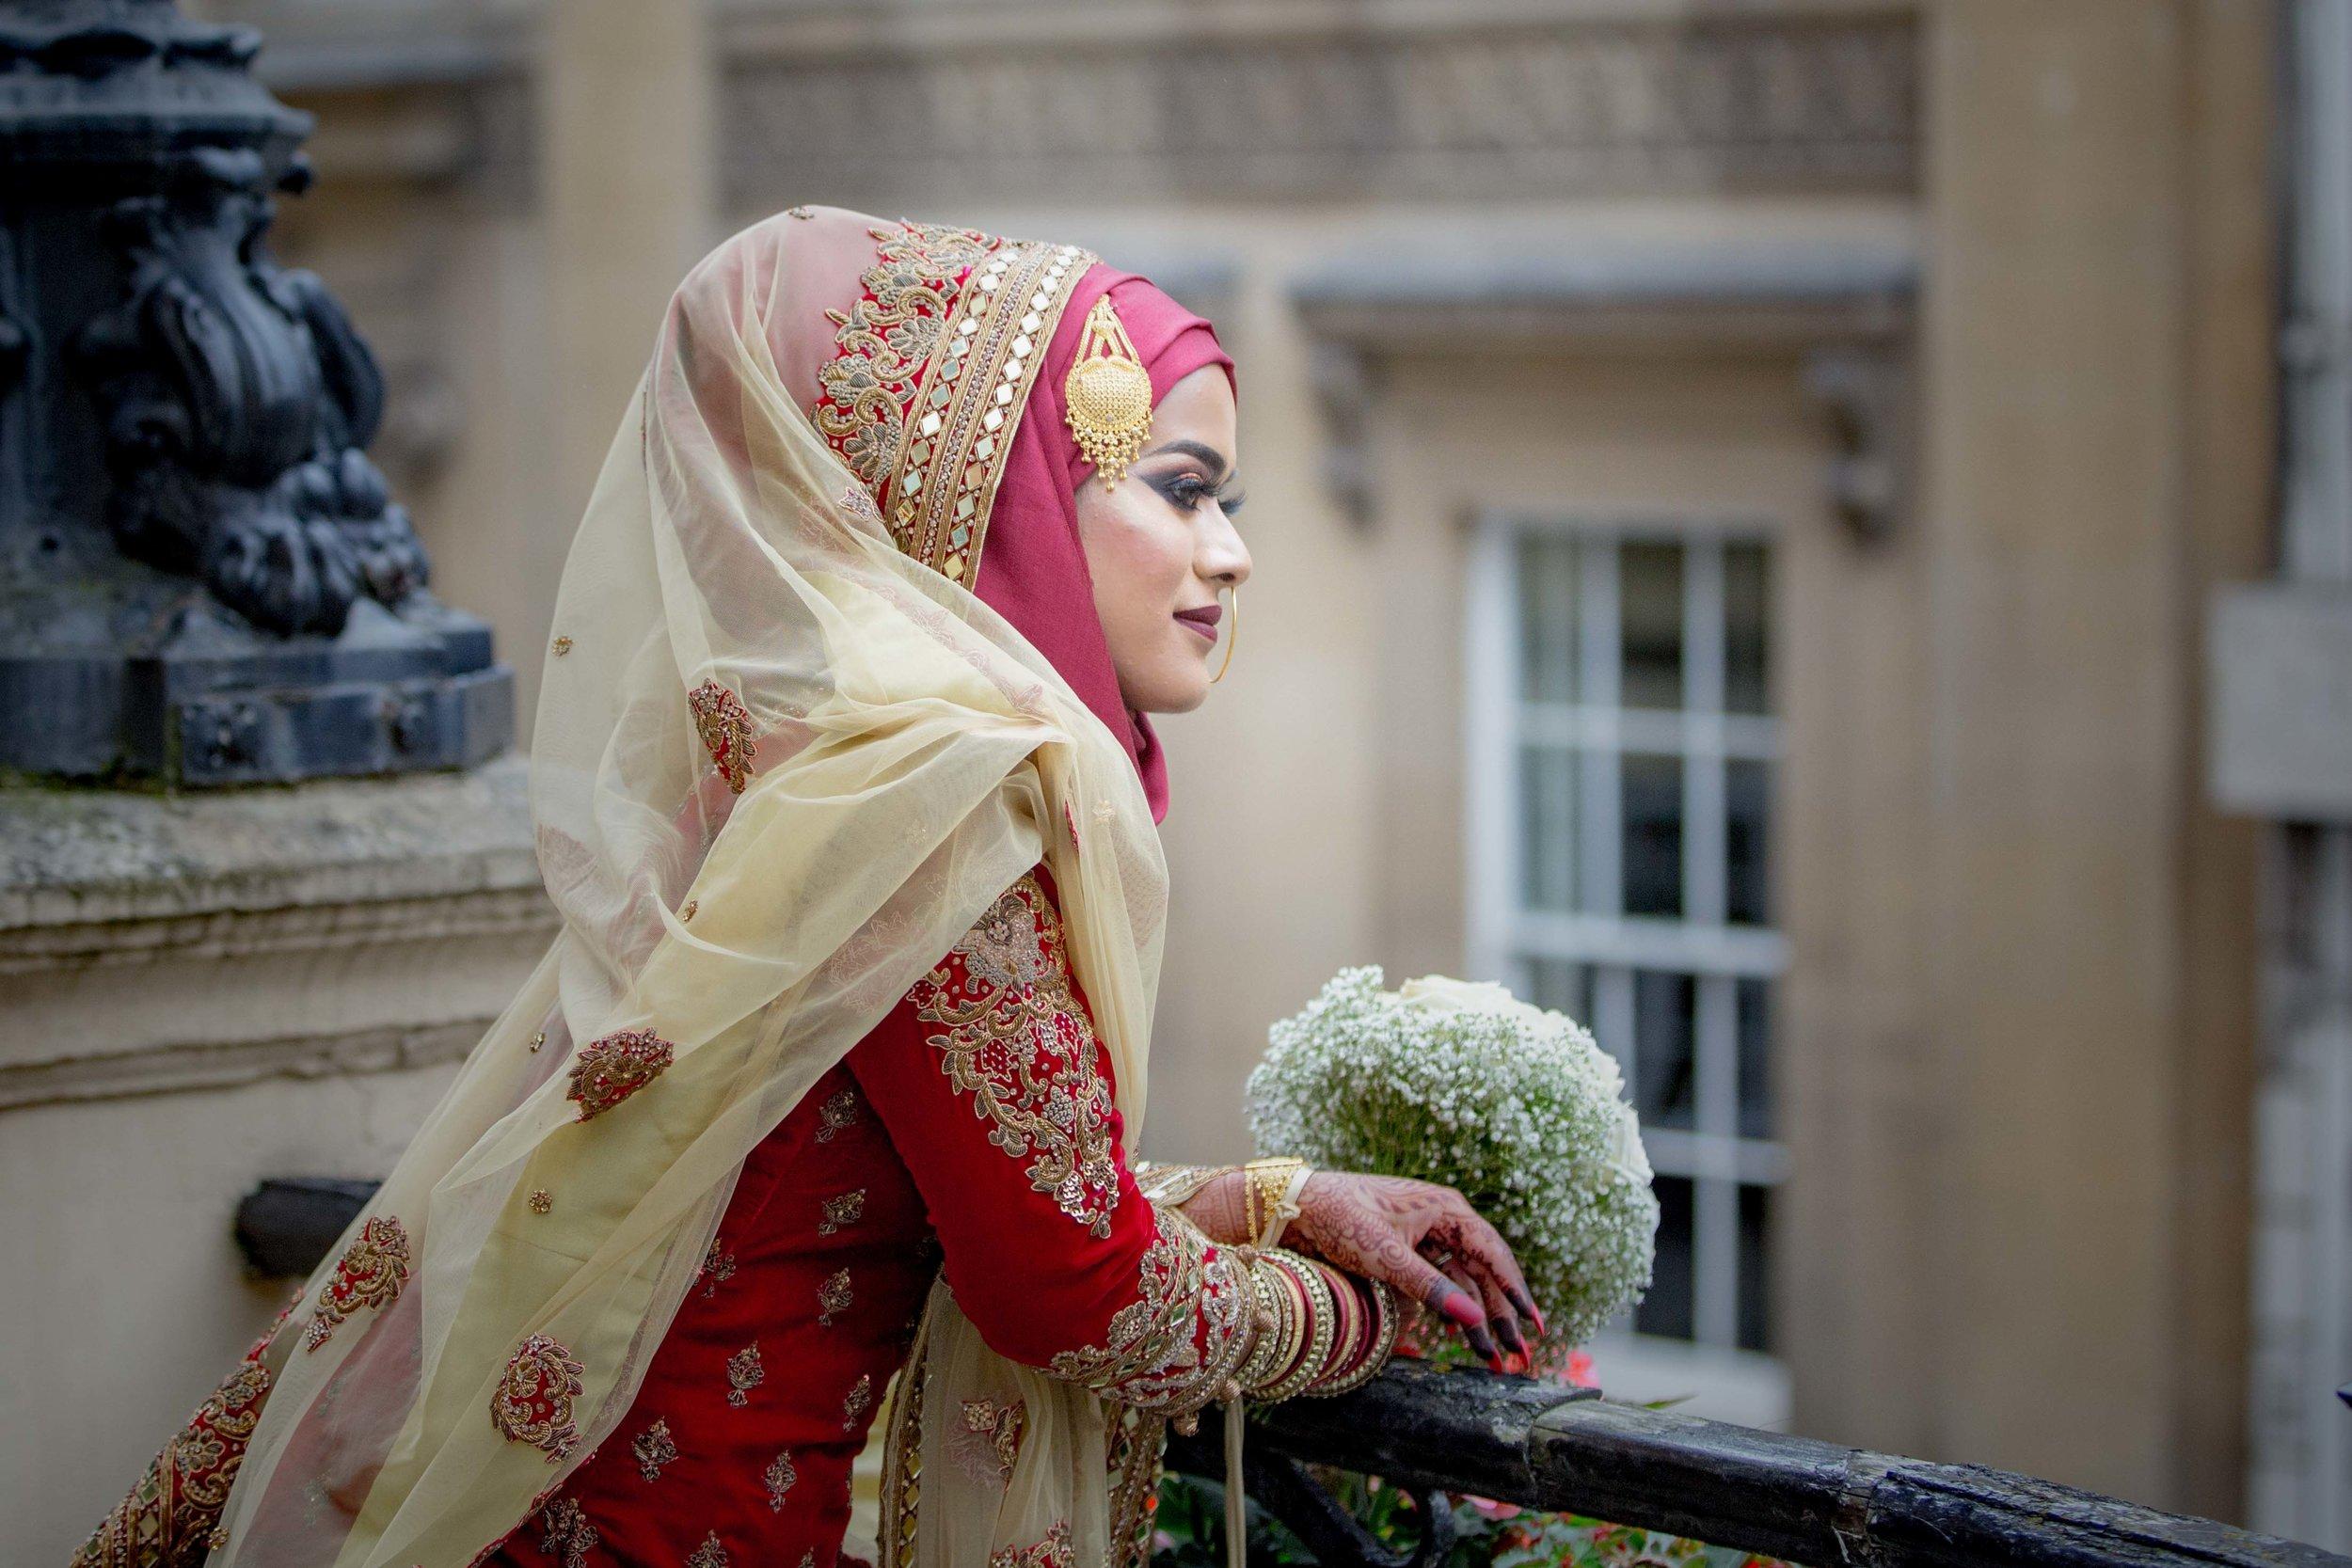 Female-wedding-photographer-bristol-mercure-bristol-grand-hotel-natalia-smith-photography-7.jpg